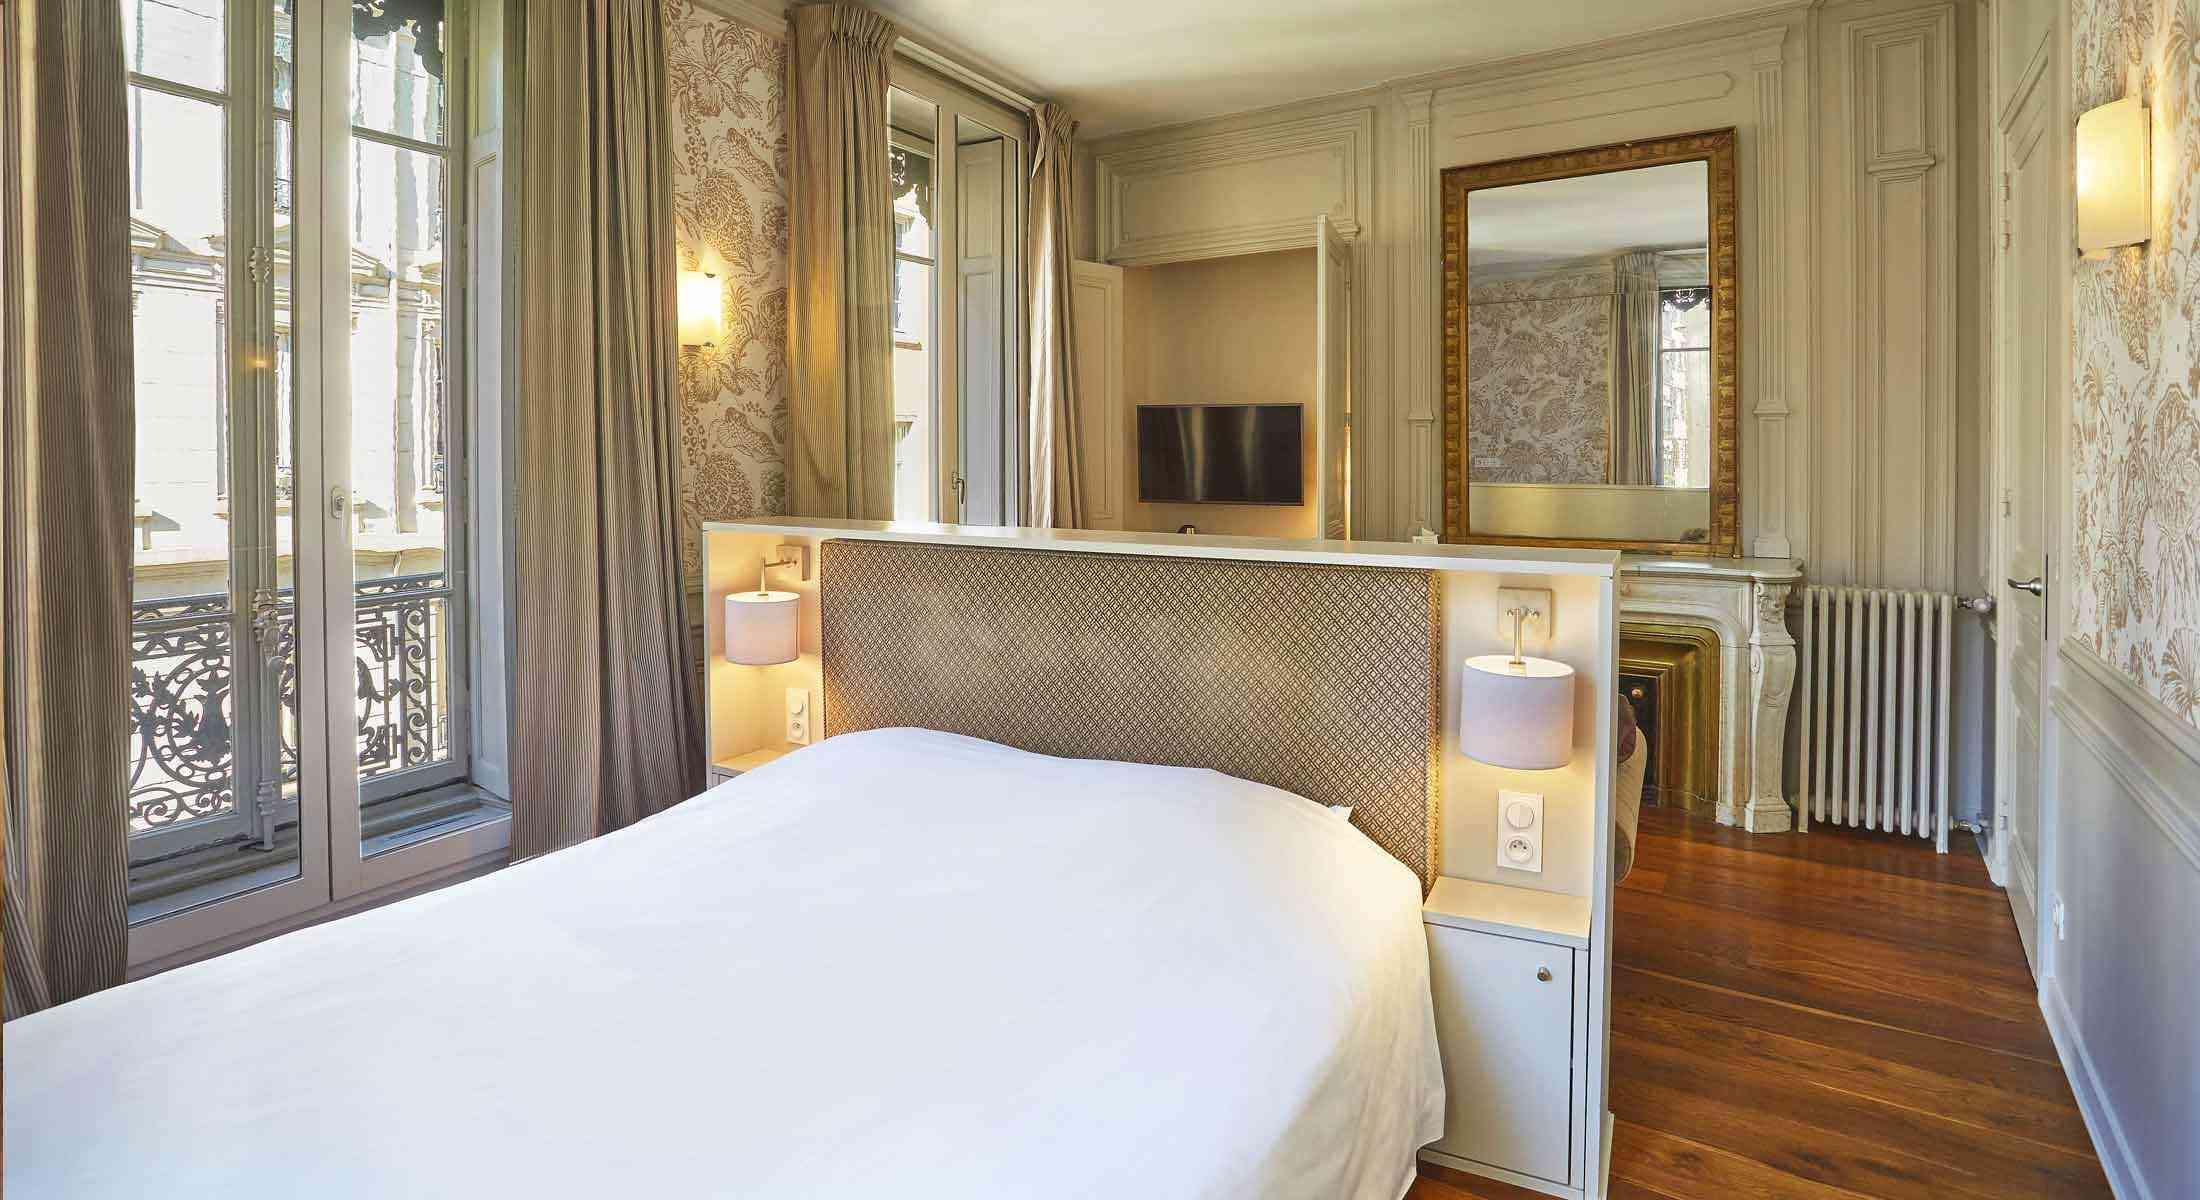 Junior suite at the 2-star Hotel Vaubecour, Lyon, France